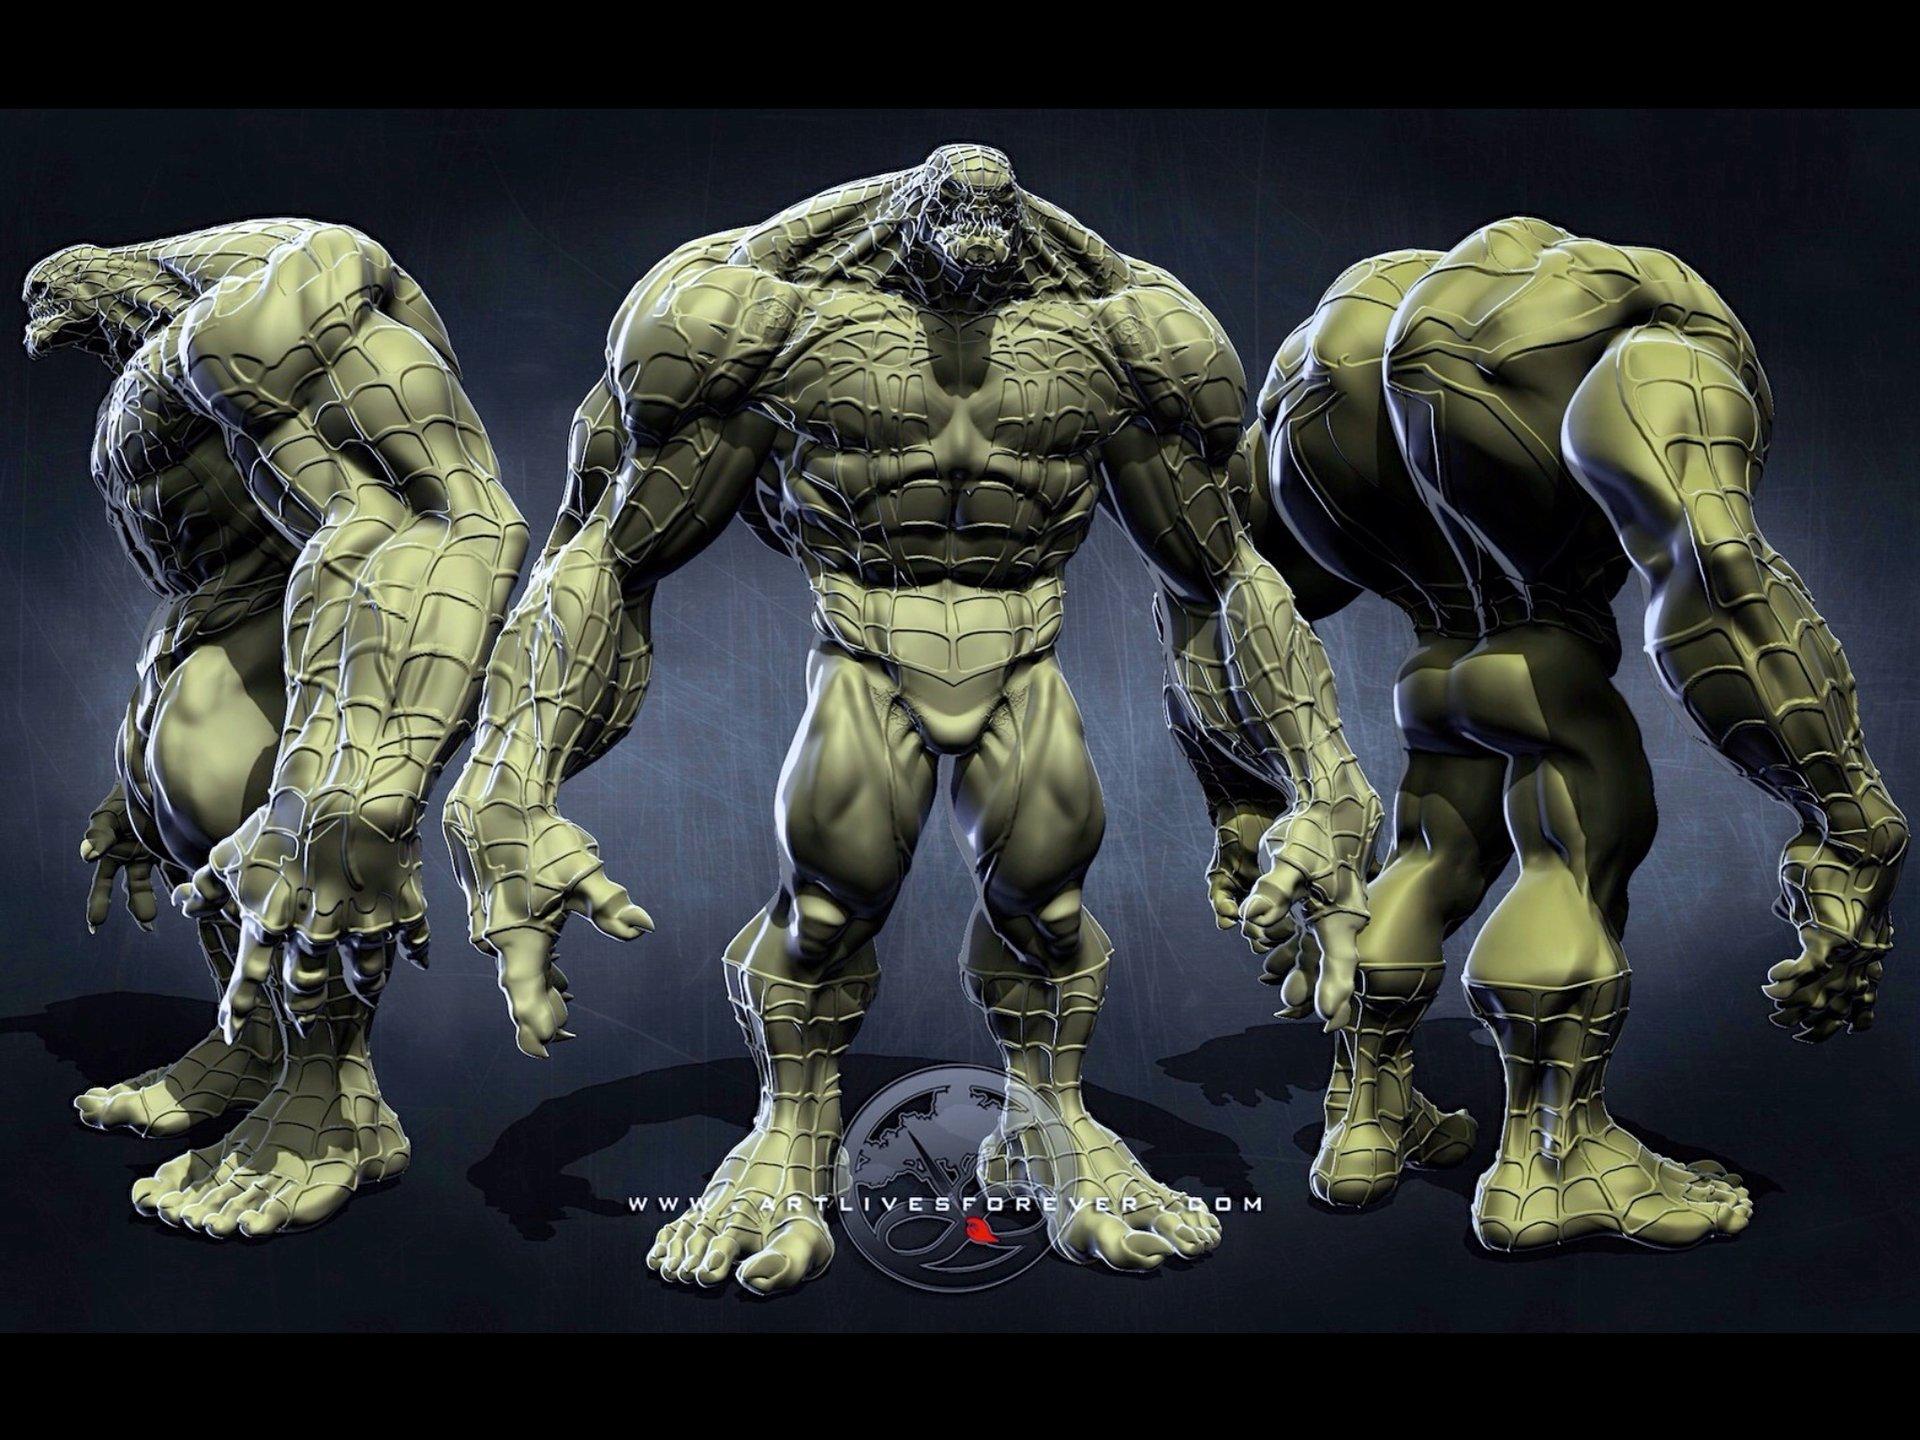 Marvel Comic's Venom! www.artlivesforever.com